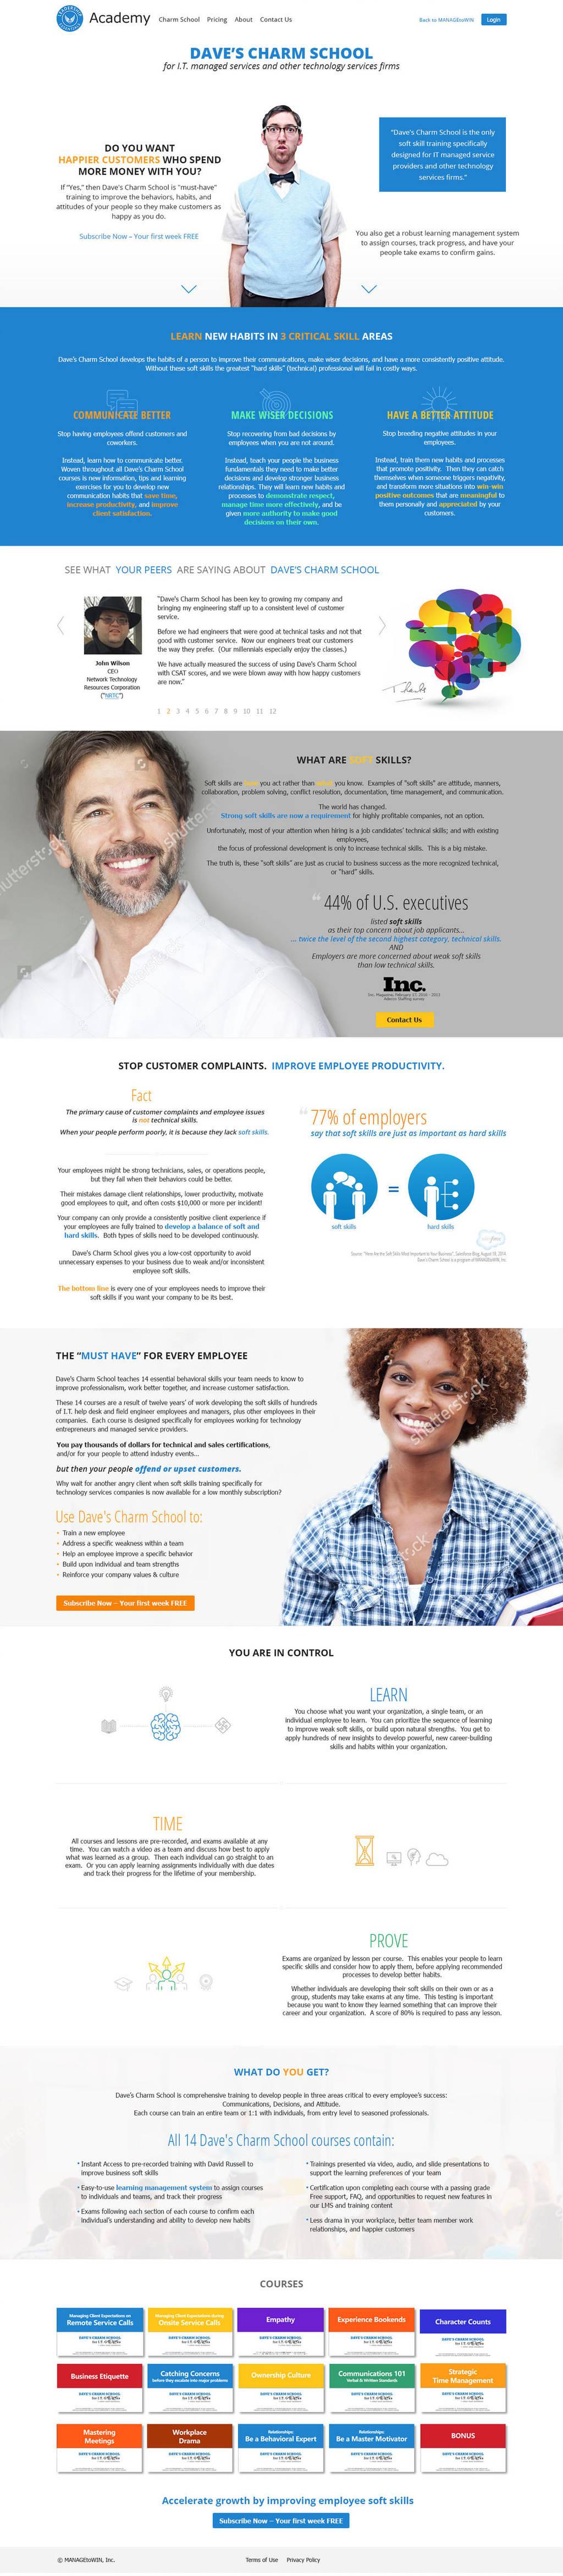 Websites | Leadership Essentials Academy v2 by AlbireoMKG